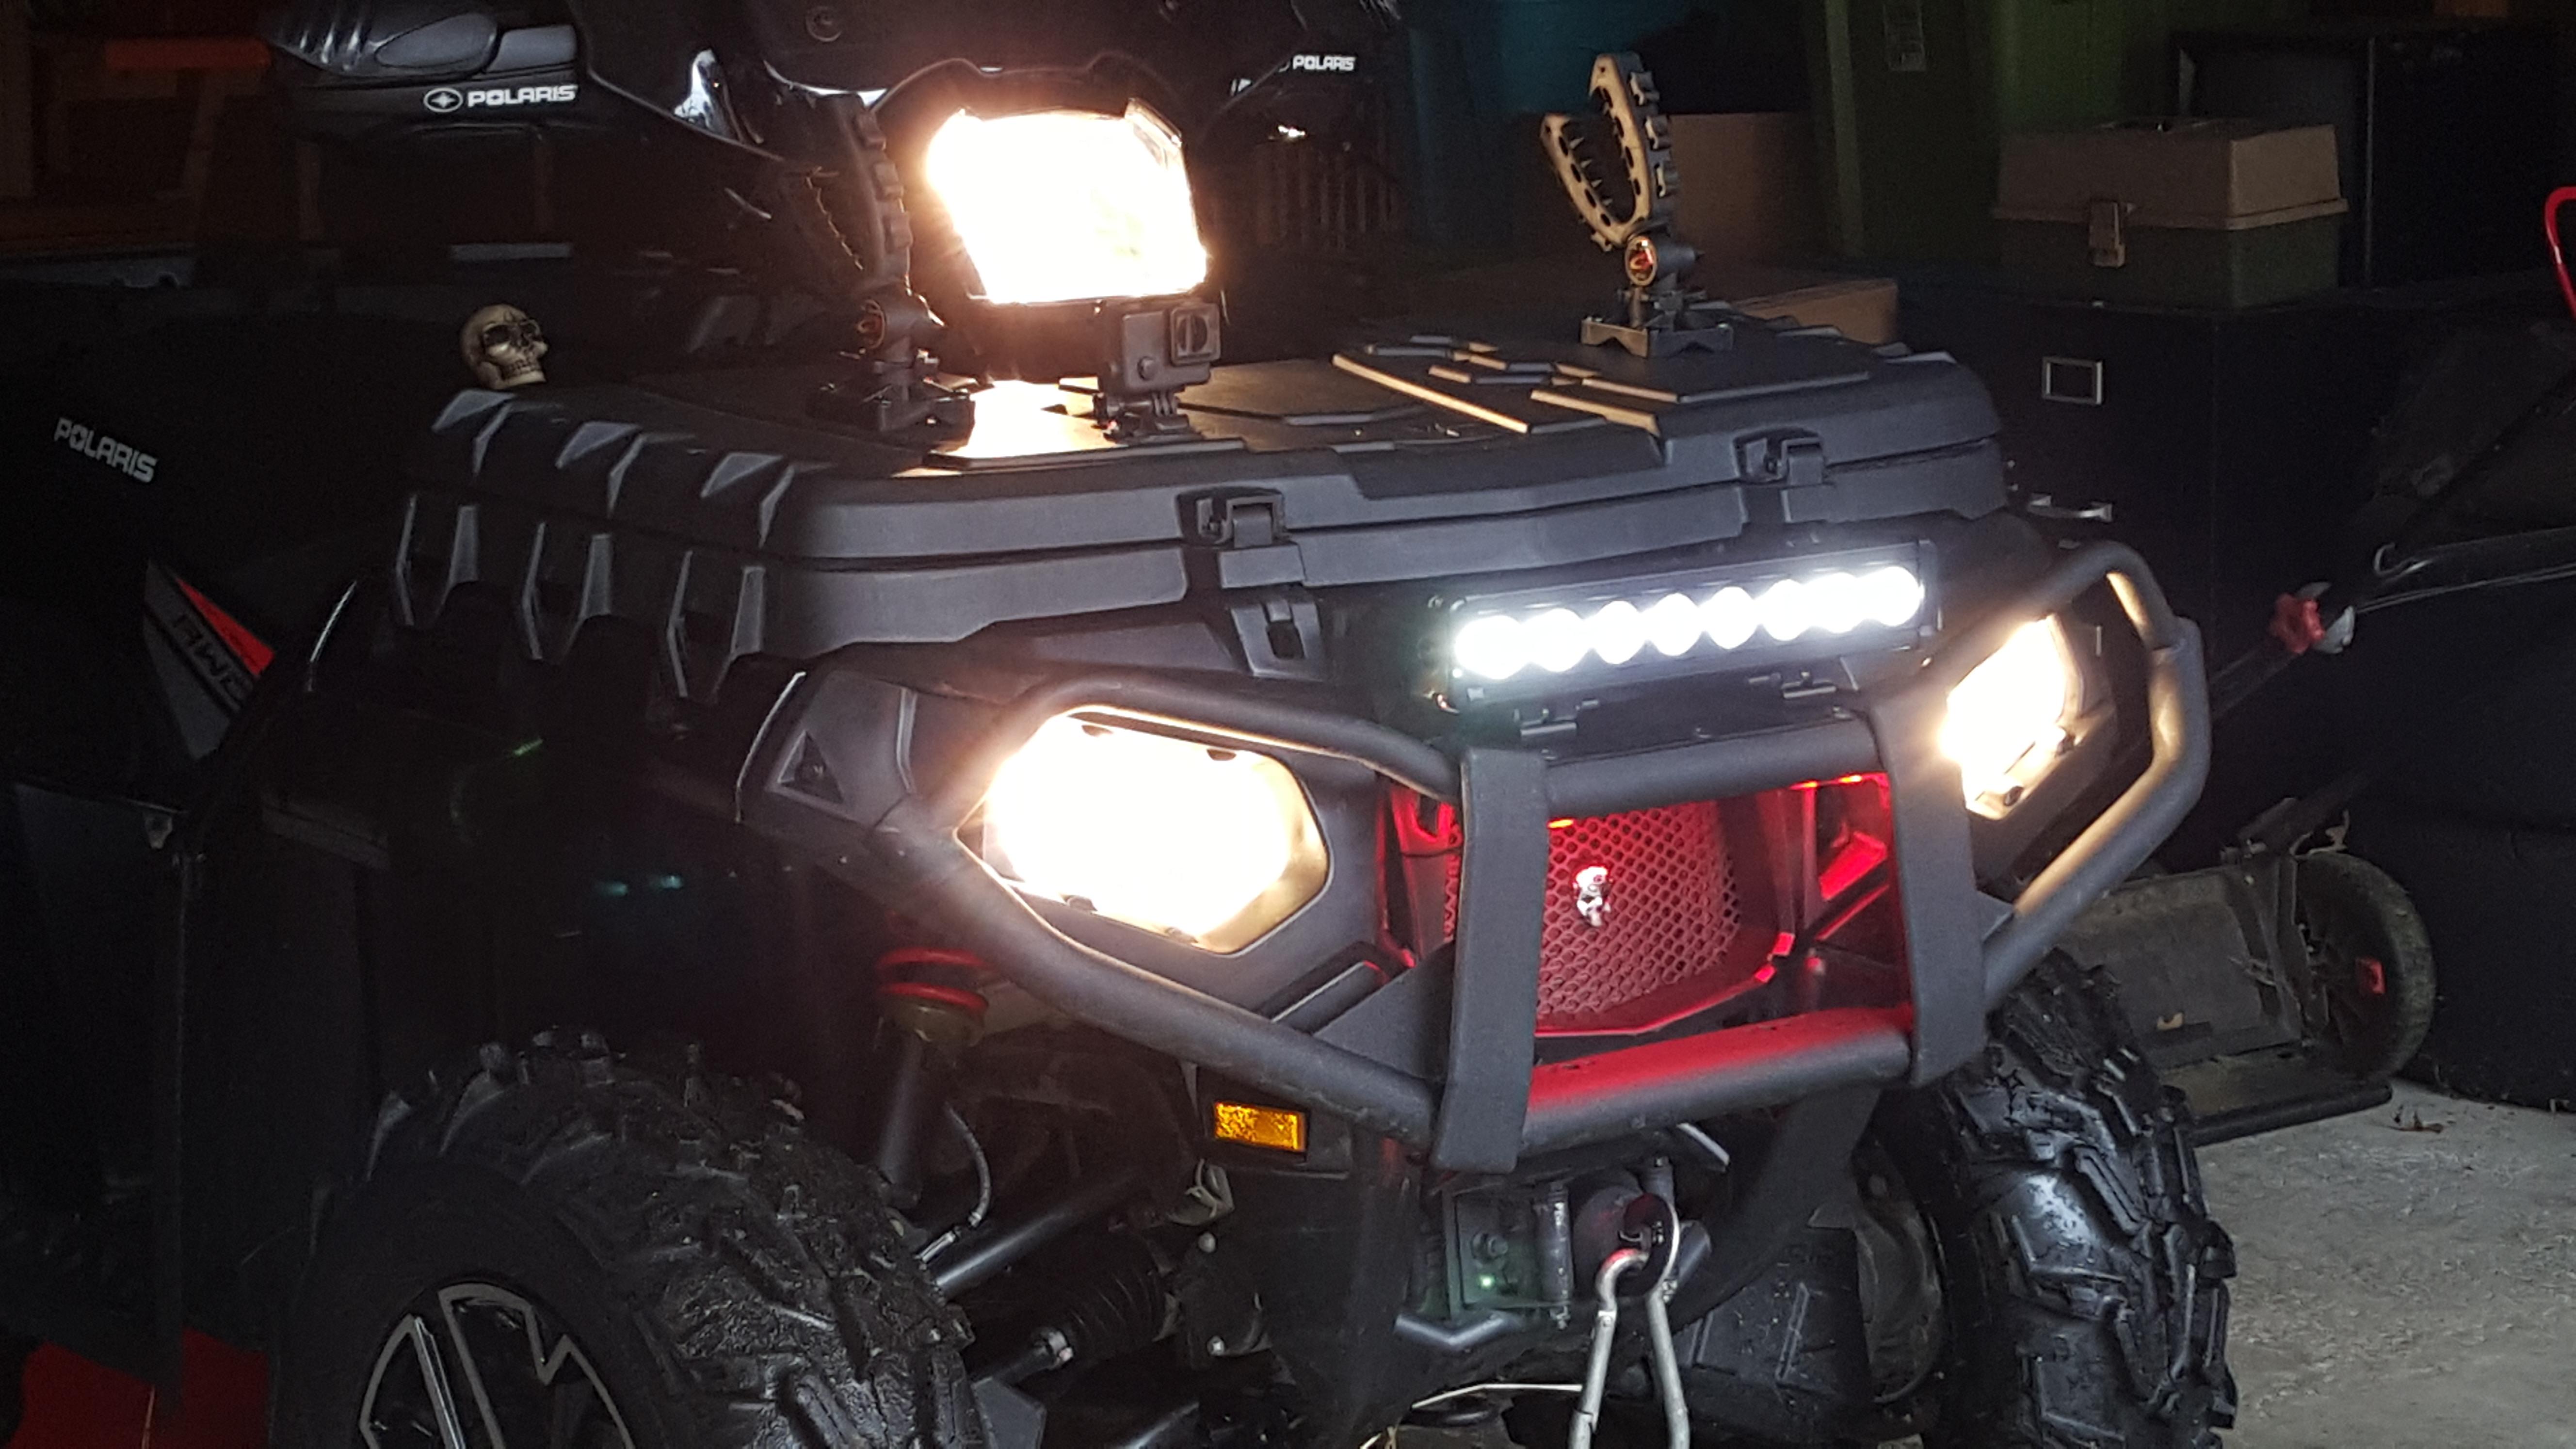 Single Row Led Light Bar >> Polaris LED light bar replacement - Polaris ATV Forum